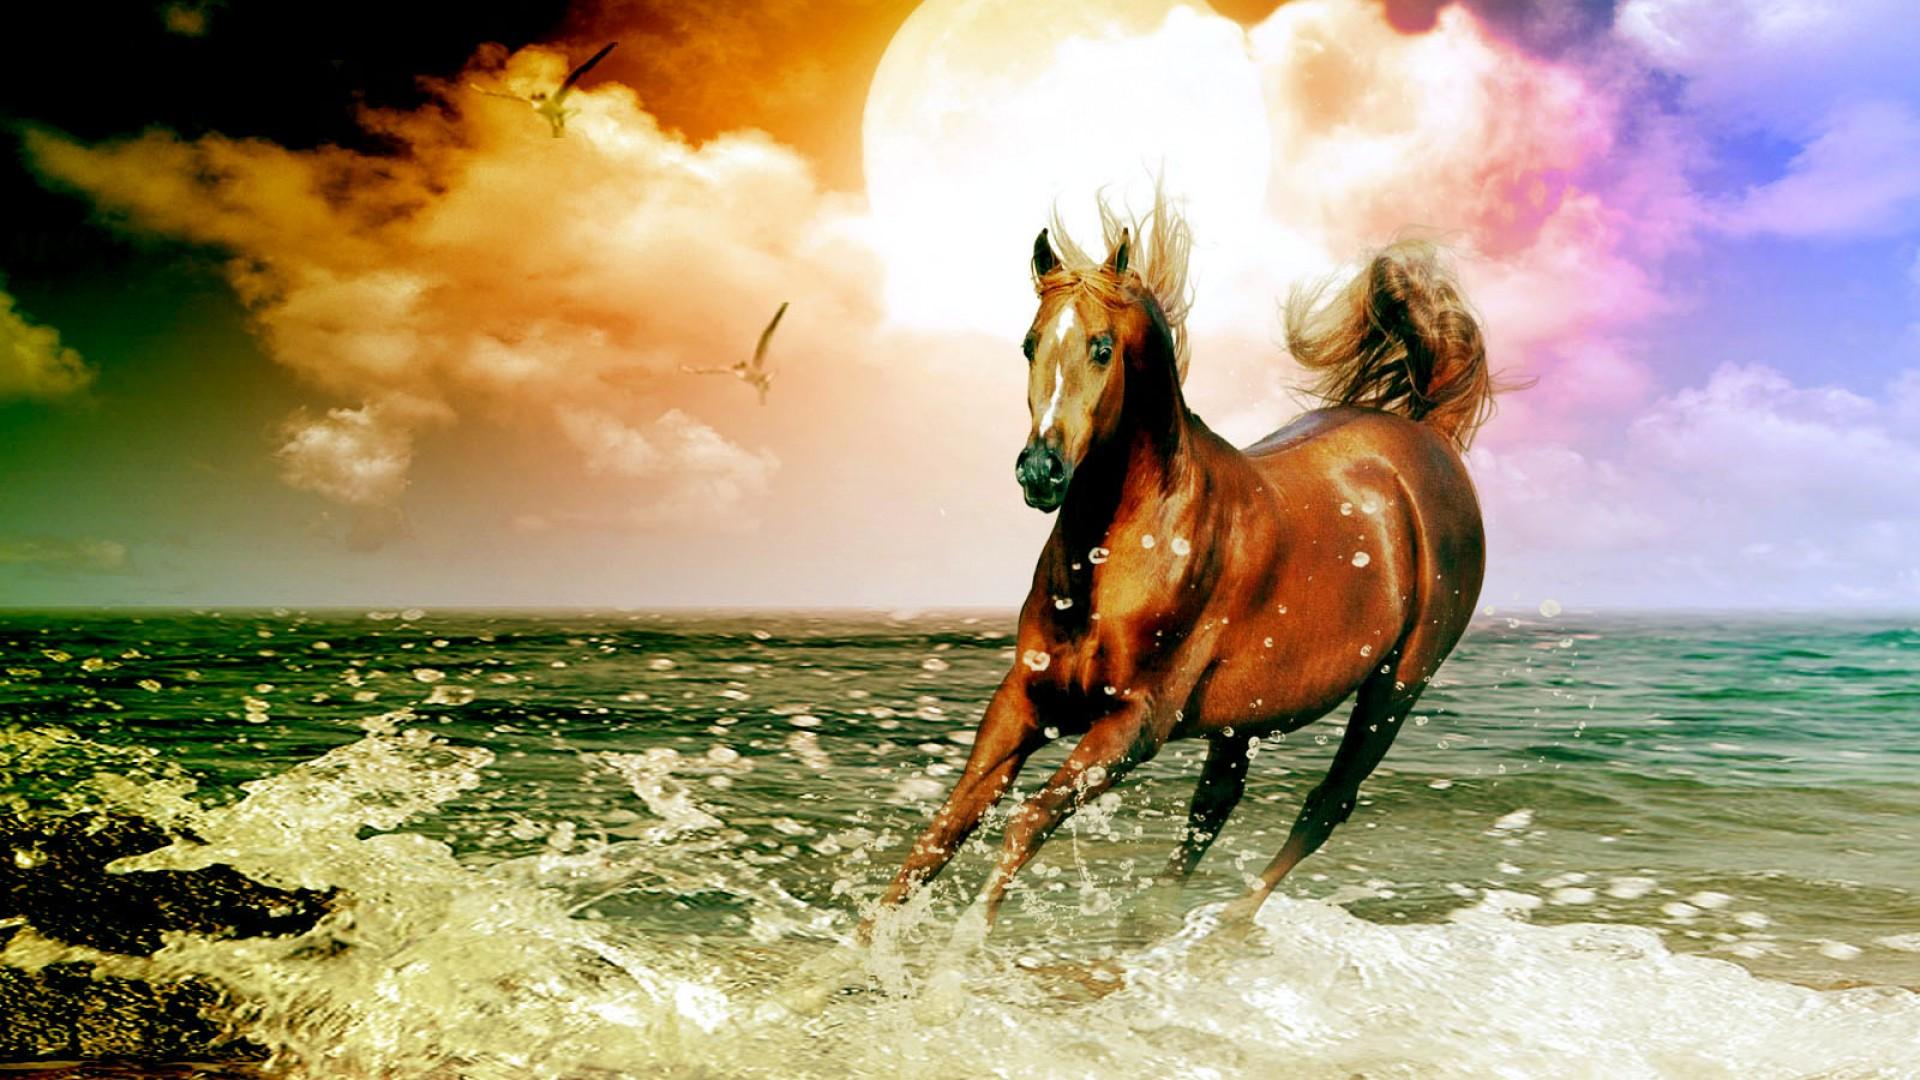 Arabian Horse Beach Desktop Wallpaper in high resolution for 1920x1080